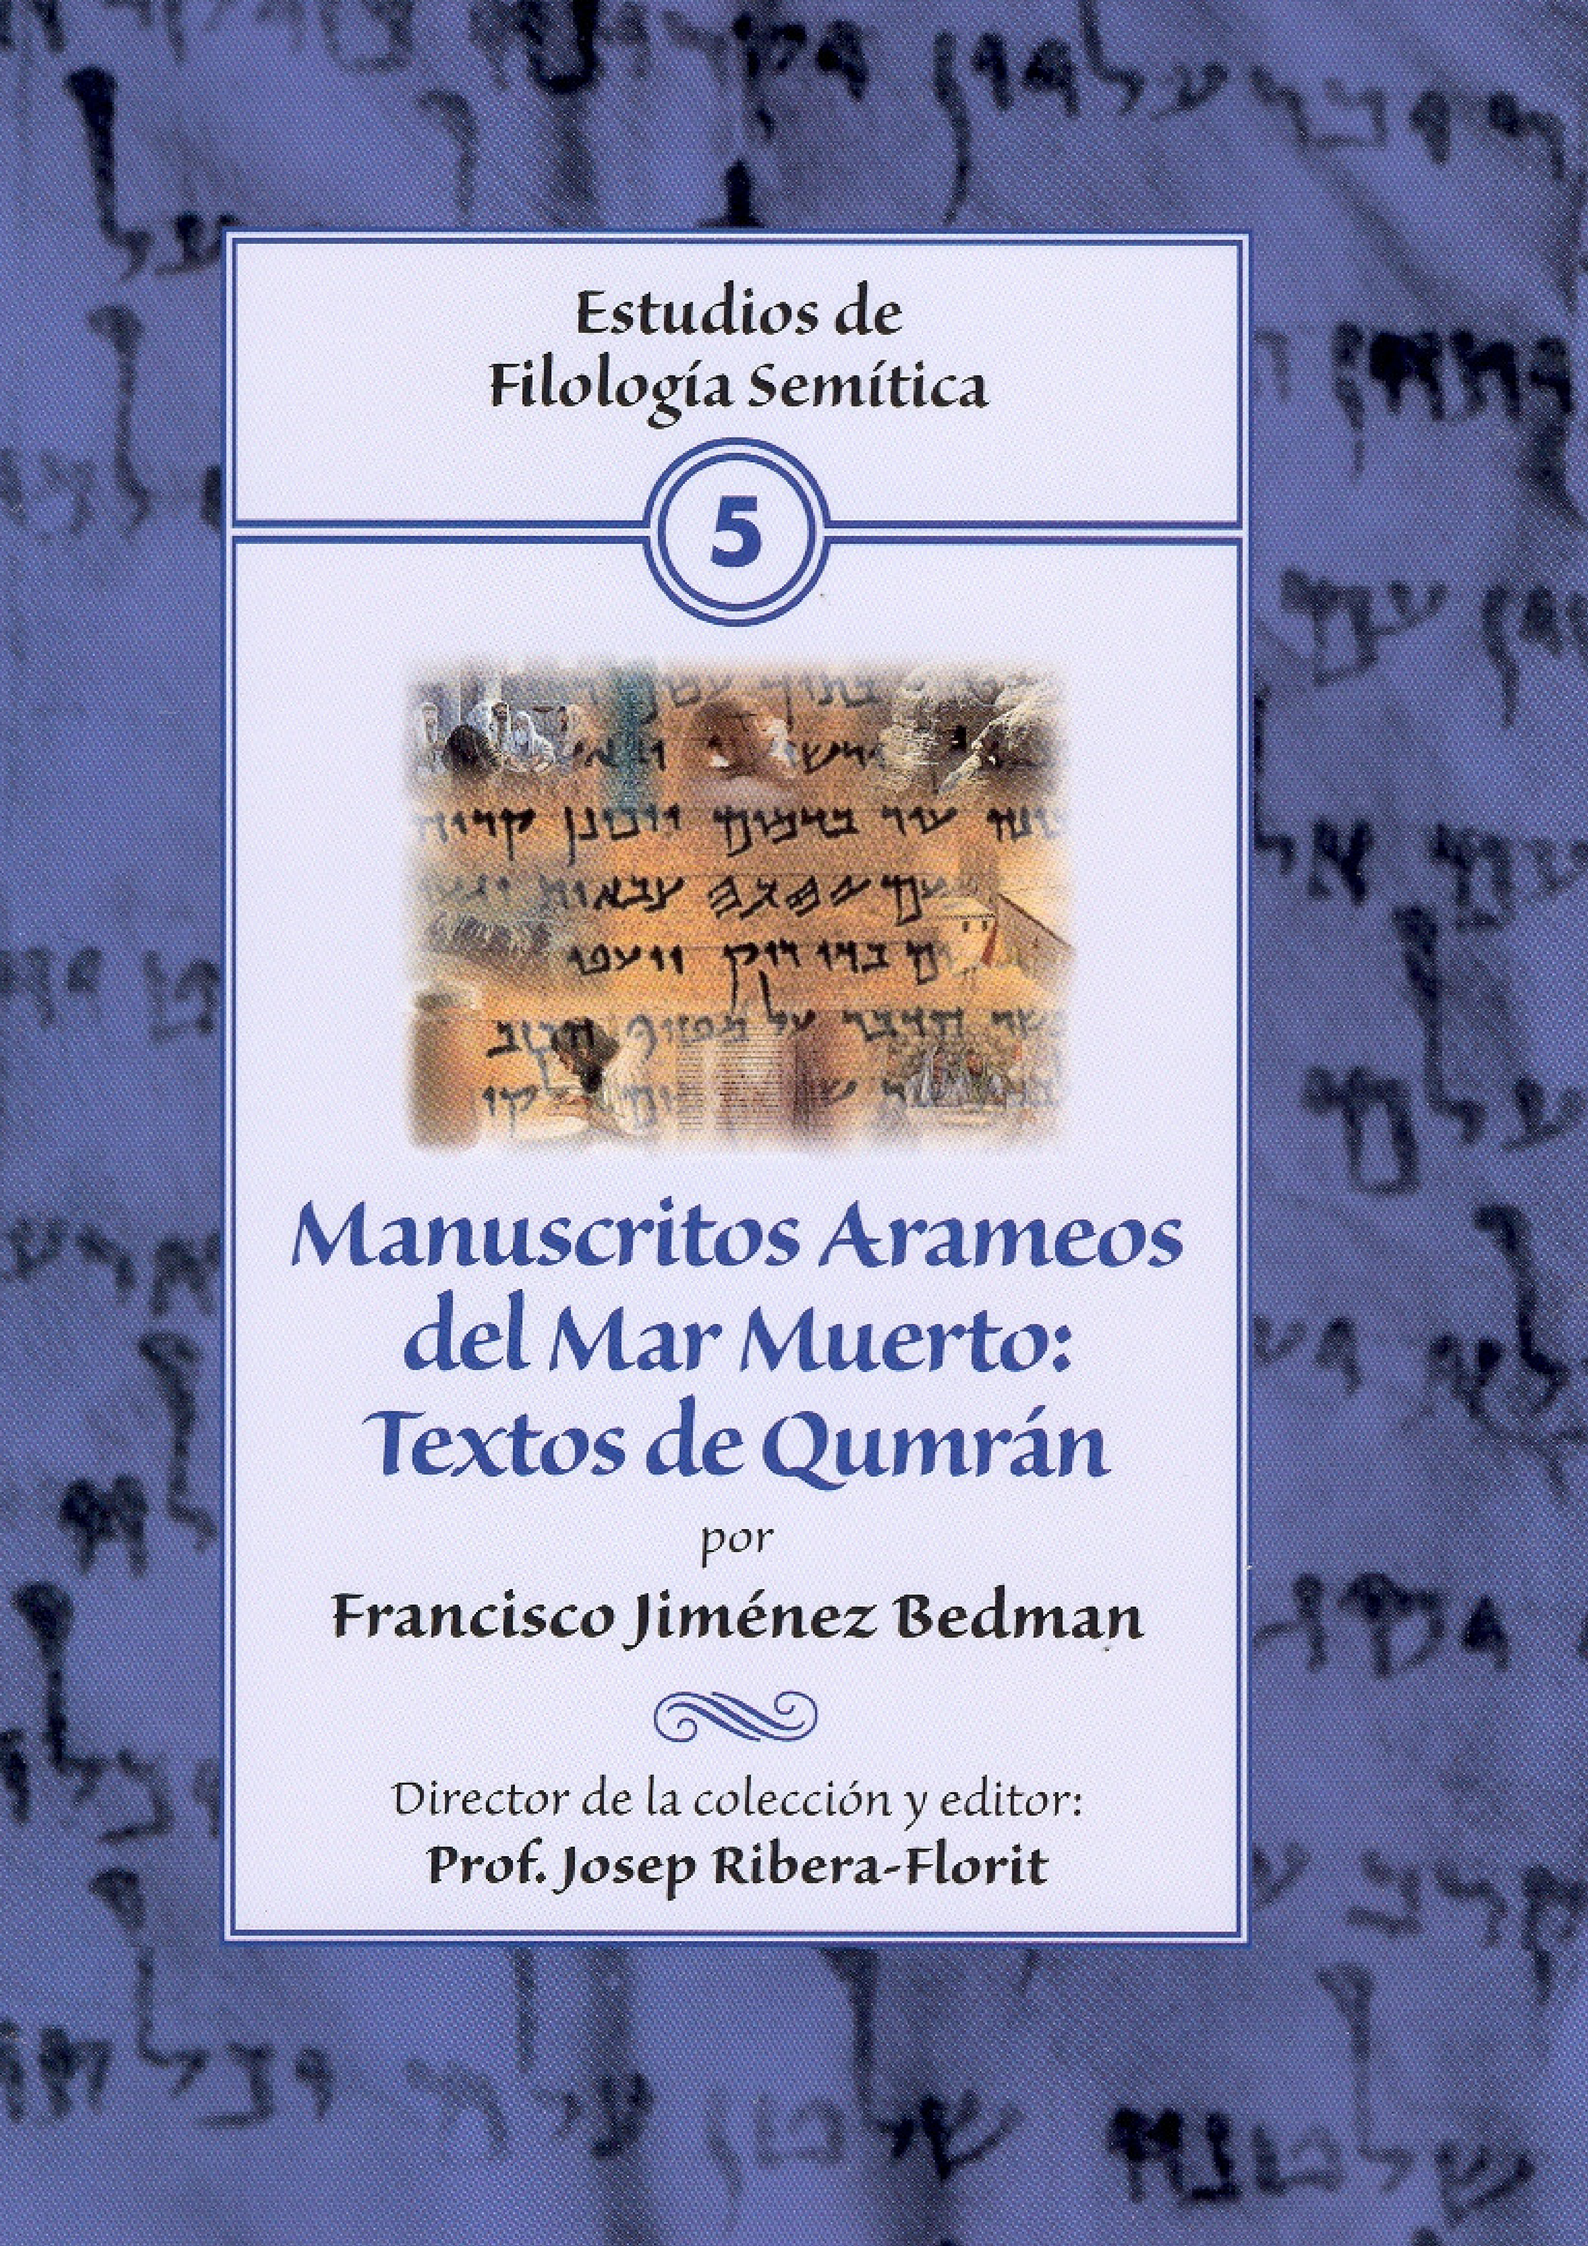 Manuscritos Arameos del Mar Muerto: Textos de Qumrán